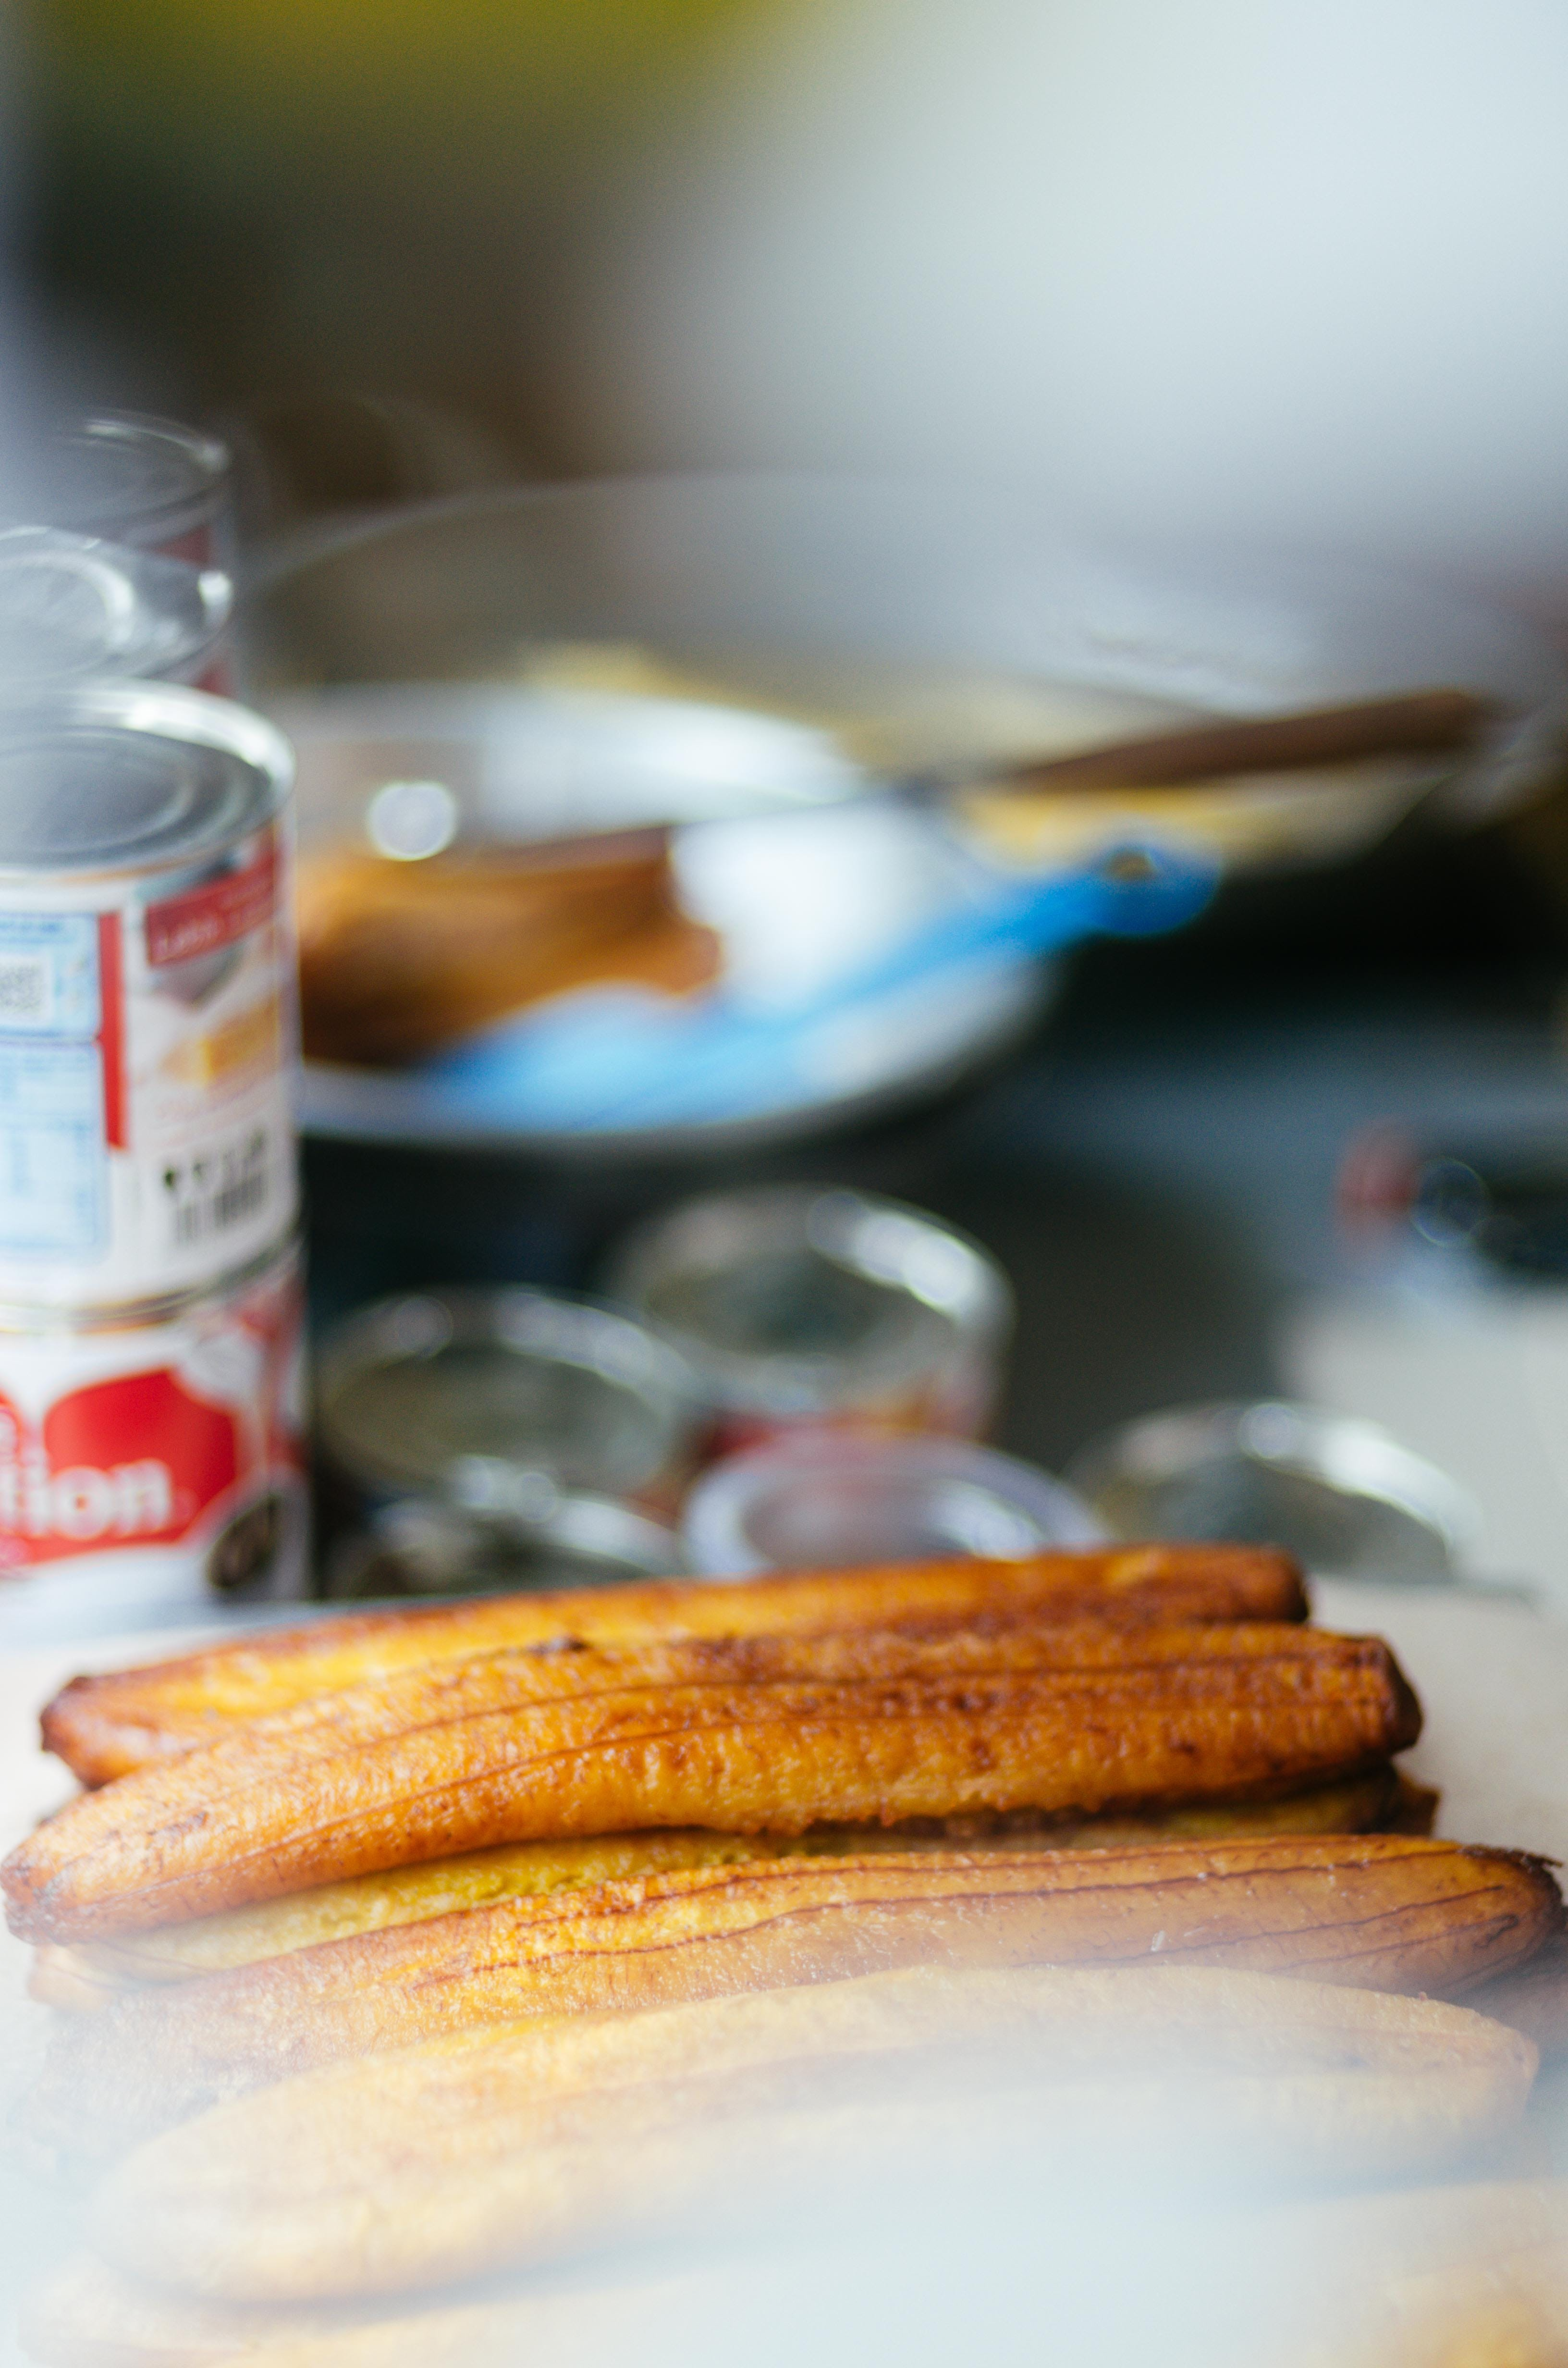 Free stock photo of food, banana